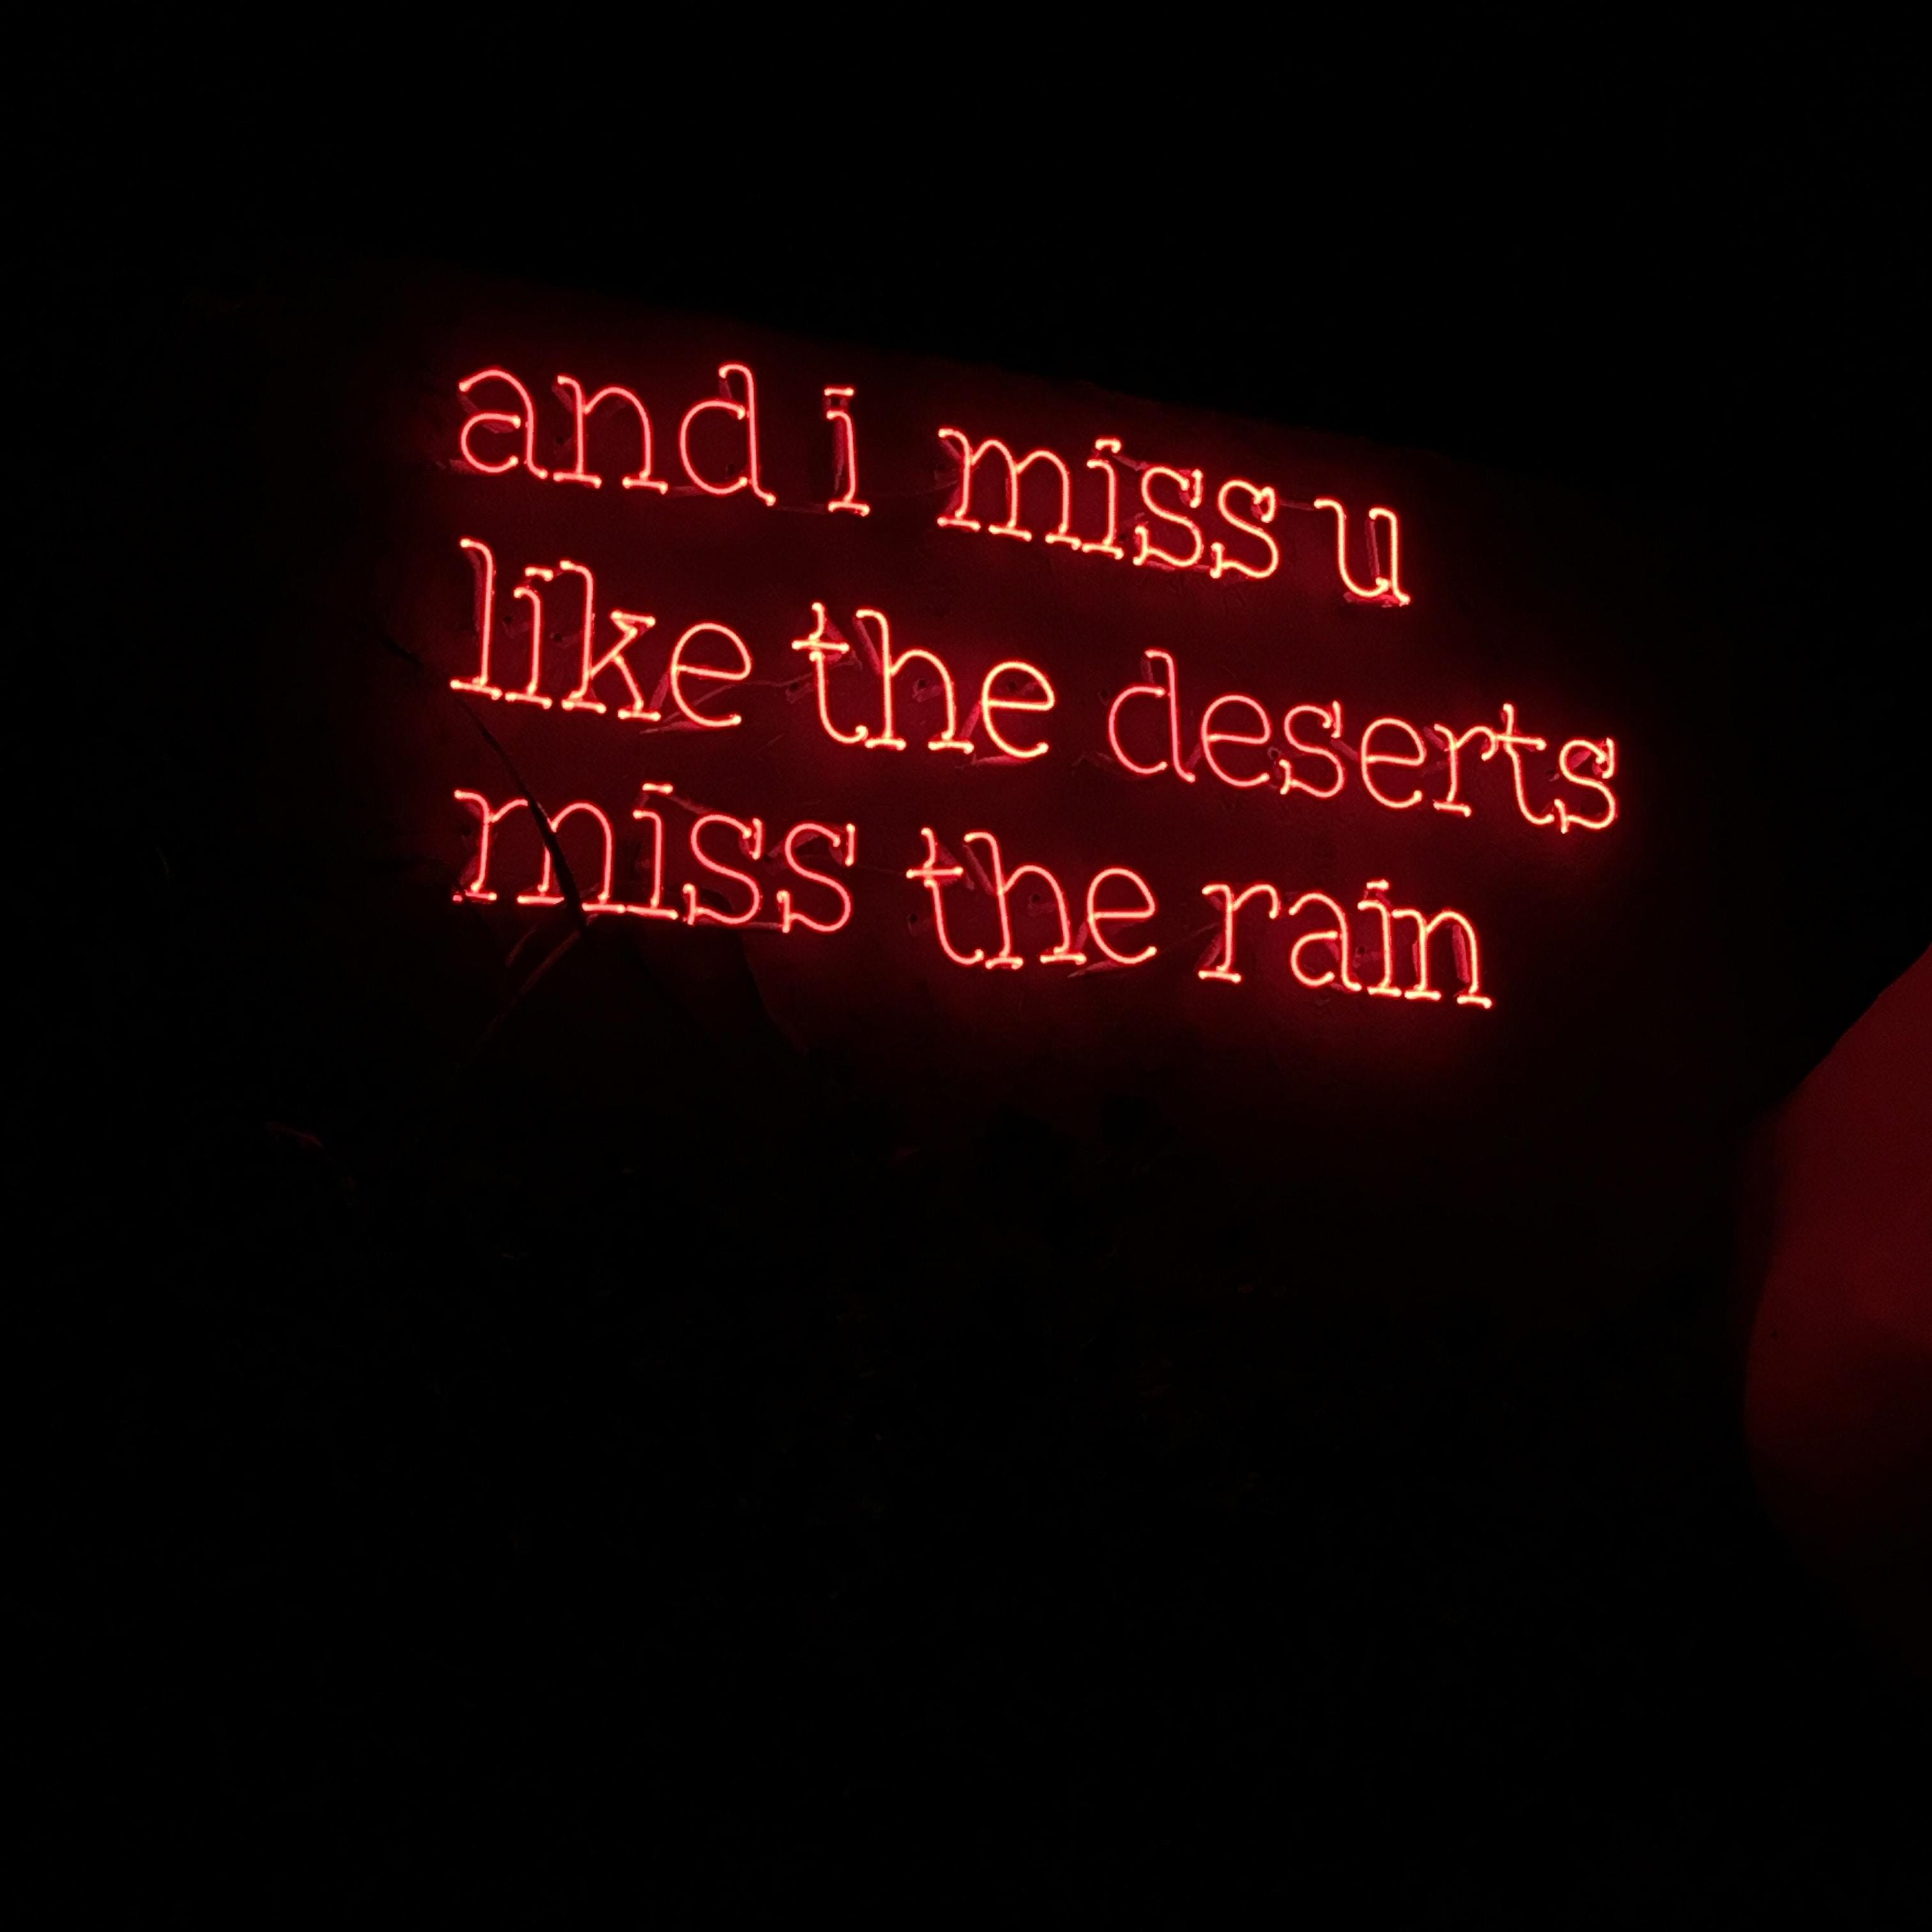 and i miss u like the deserts miss the rain text illustration